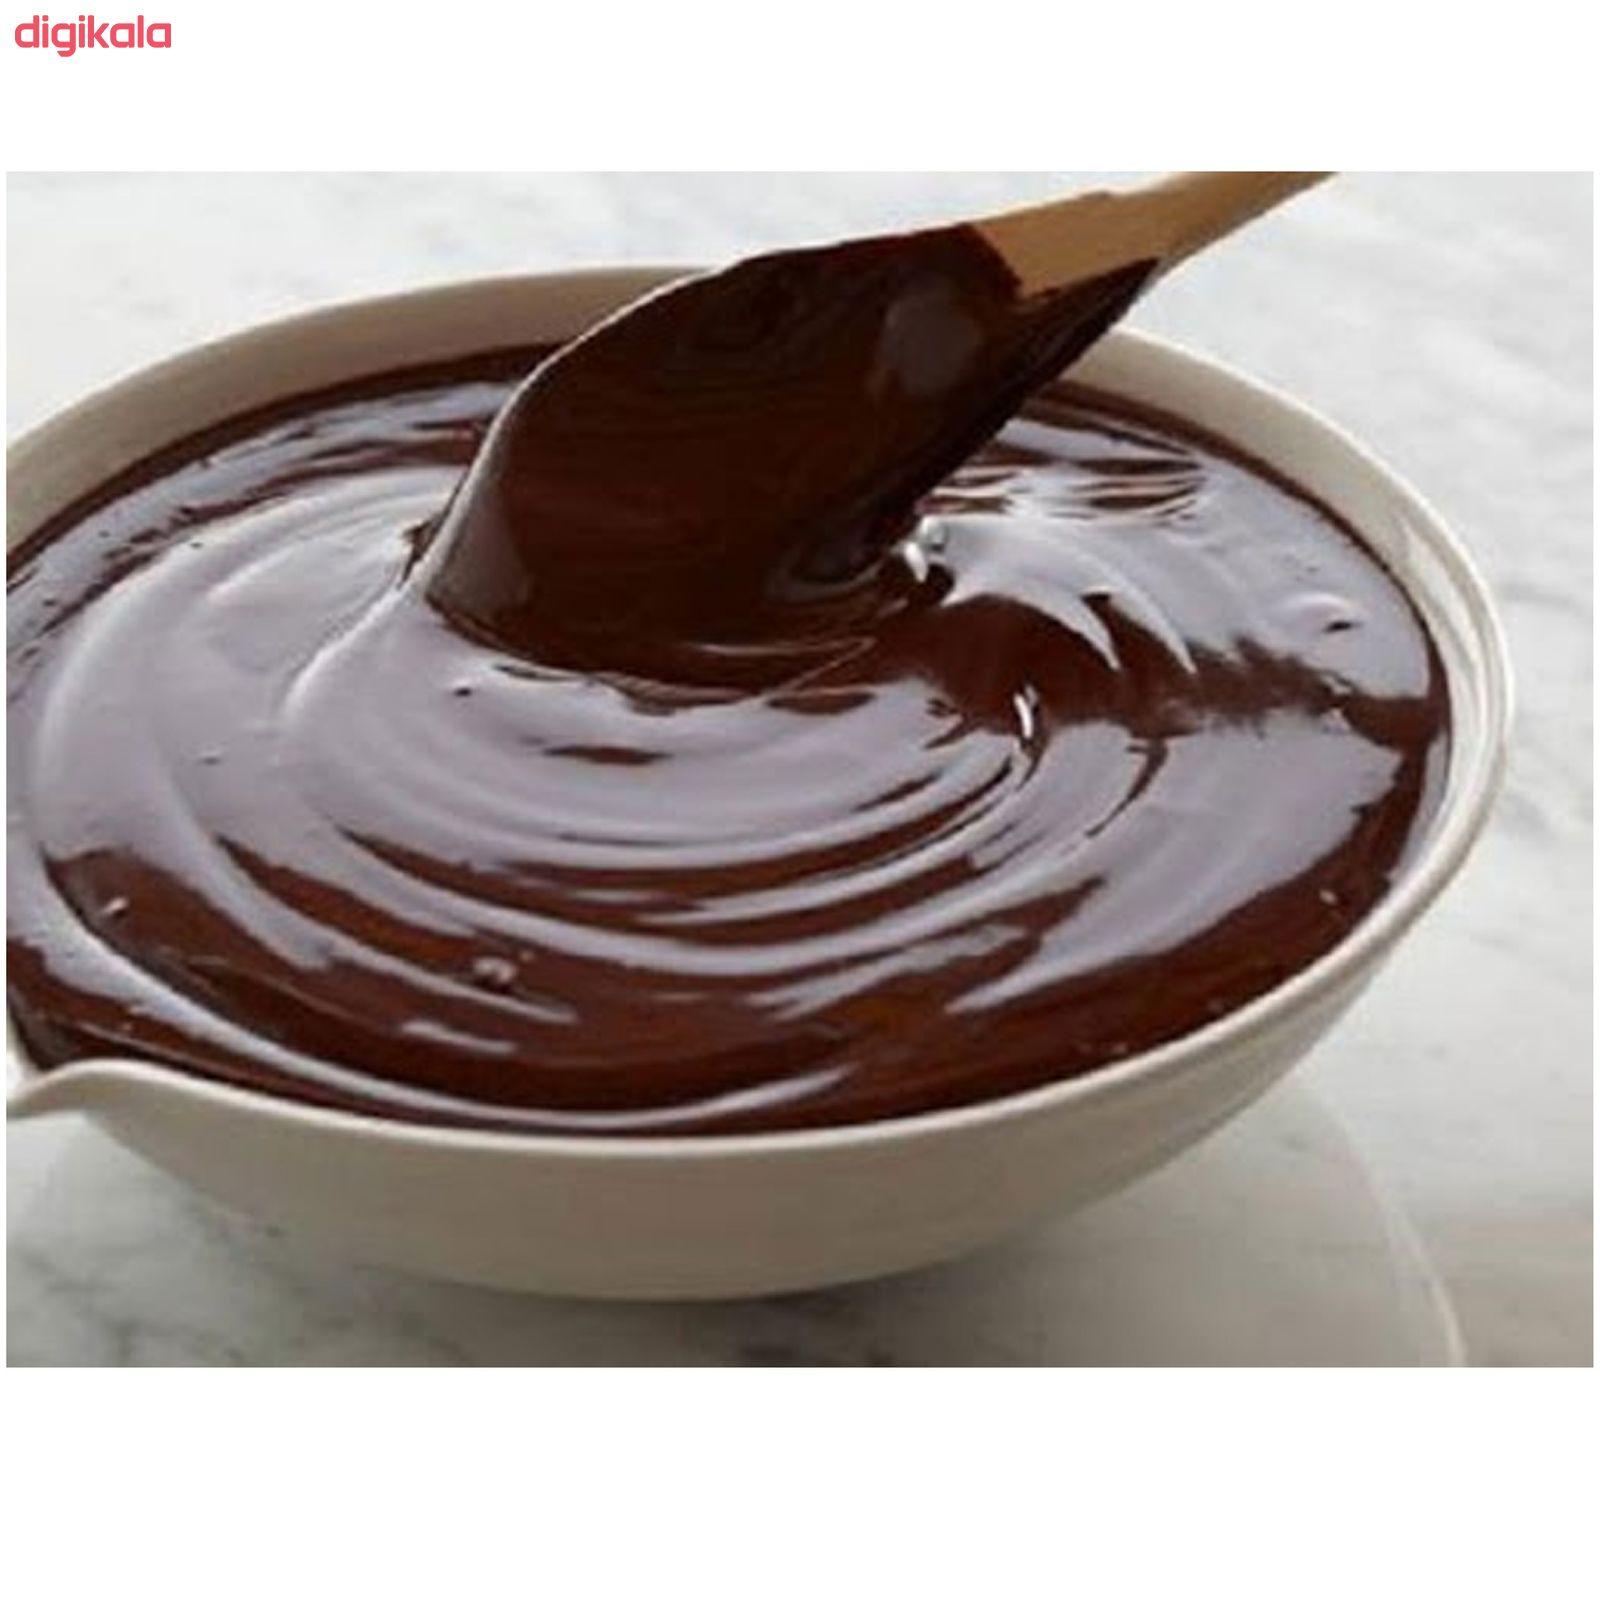 خامه کاکائویی پاک مقدار 100 گرم main 1 7